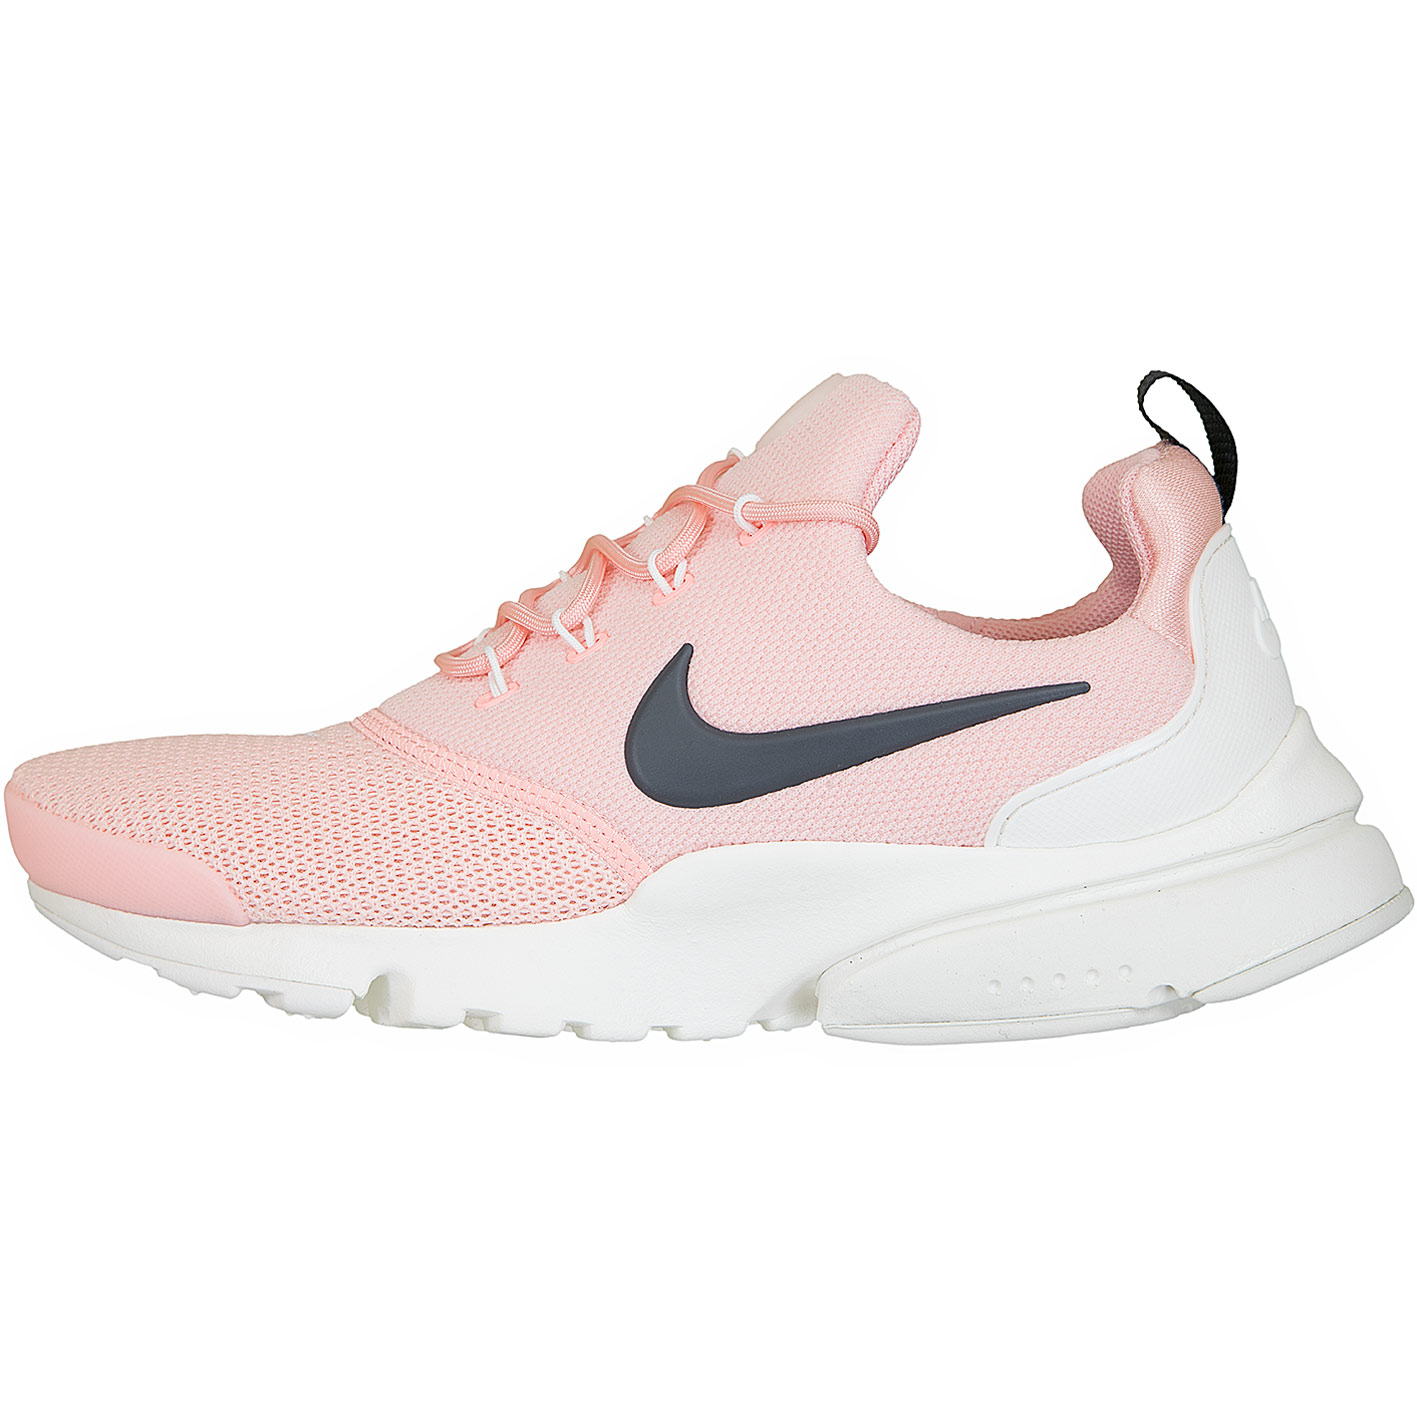 Damen Nike Turnschuhe Presto Mode Attraktive Besteellen hier